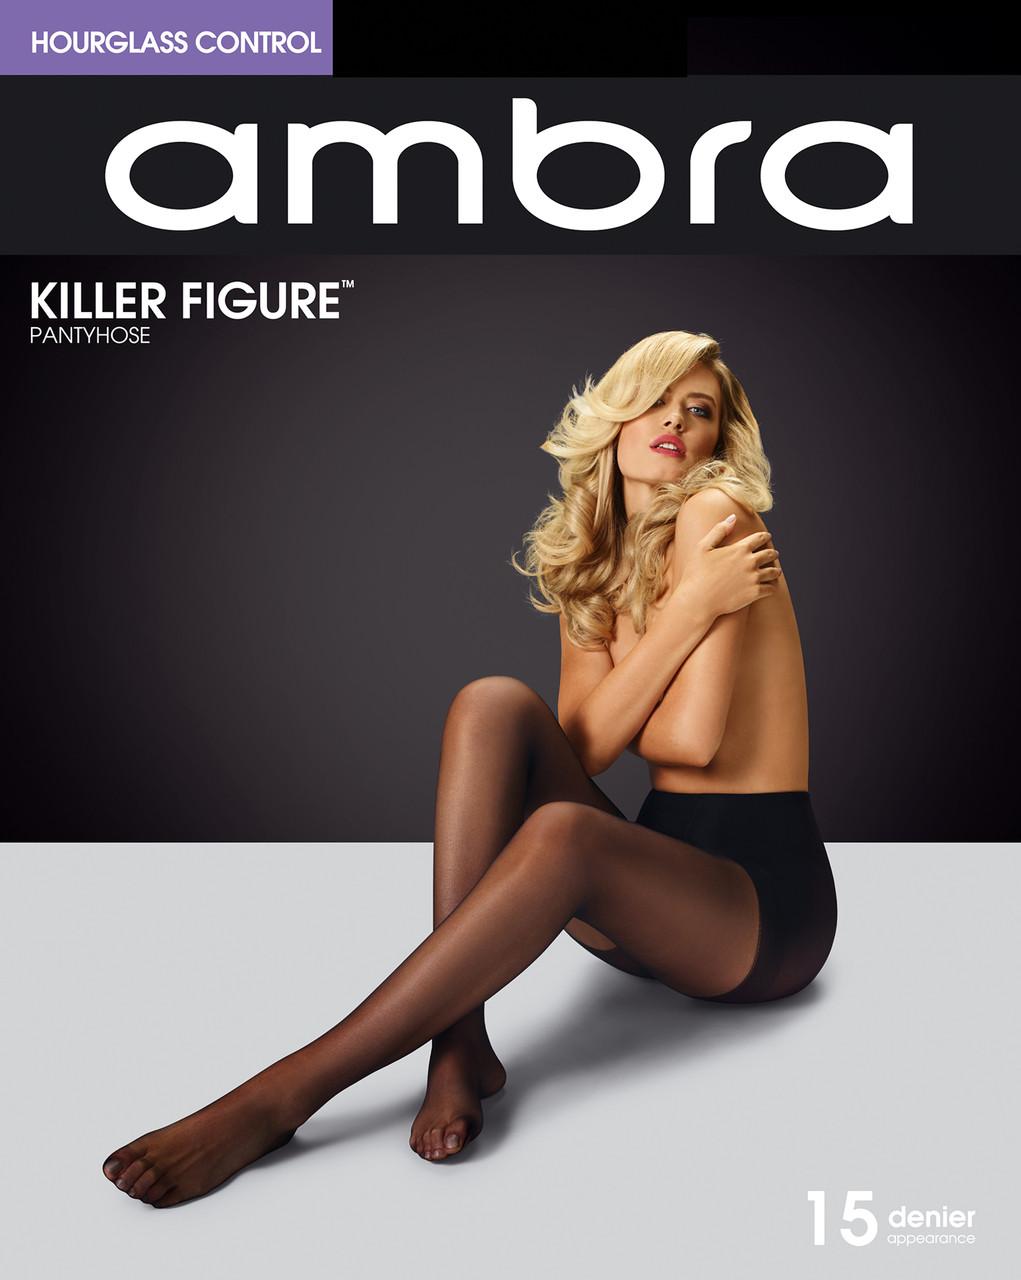 6d1da395ac389 Ambra Killer Figure Hourglass Control Pantyhose 15 Denier. Price: $12.95.  Image 1